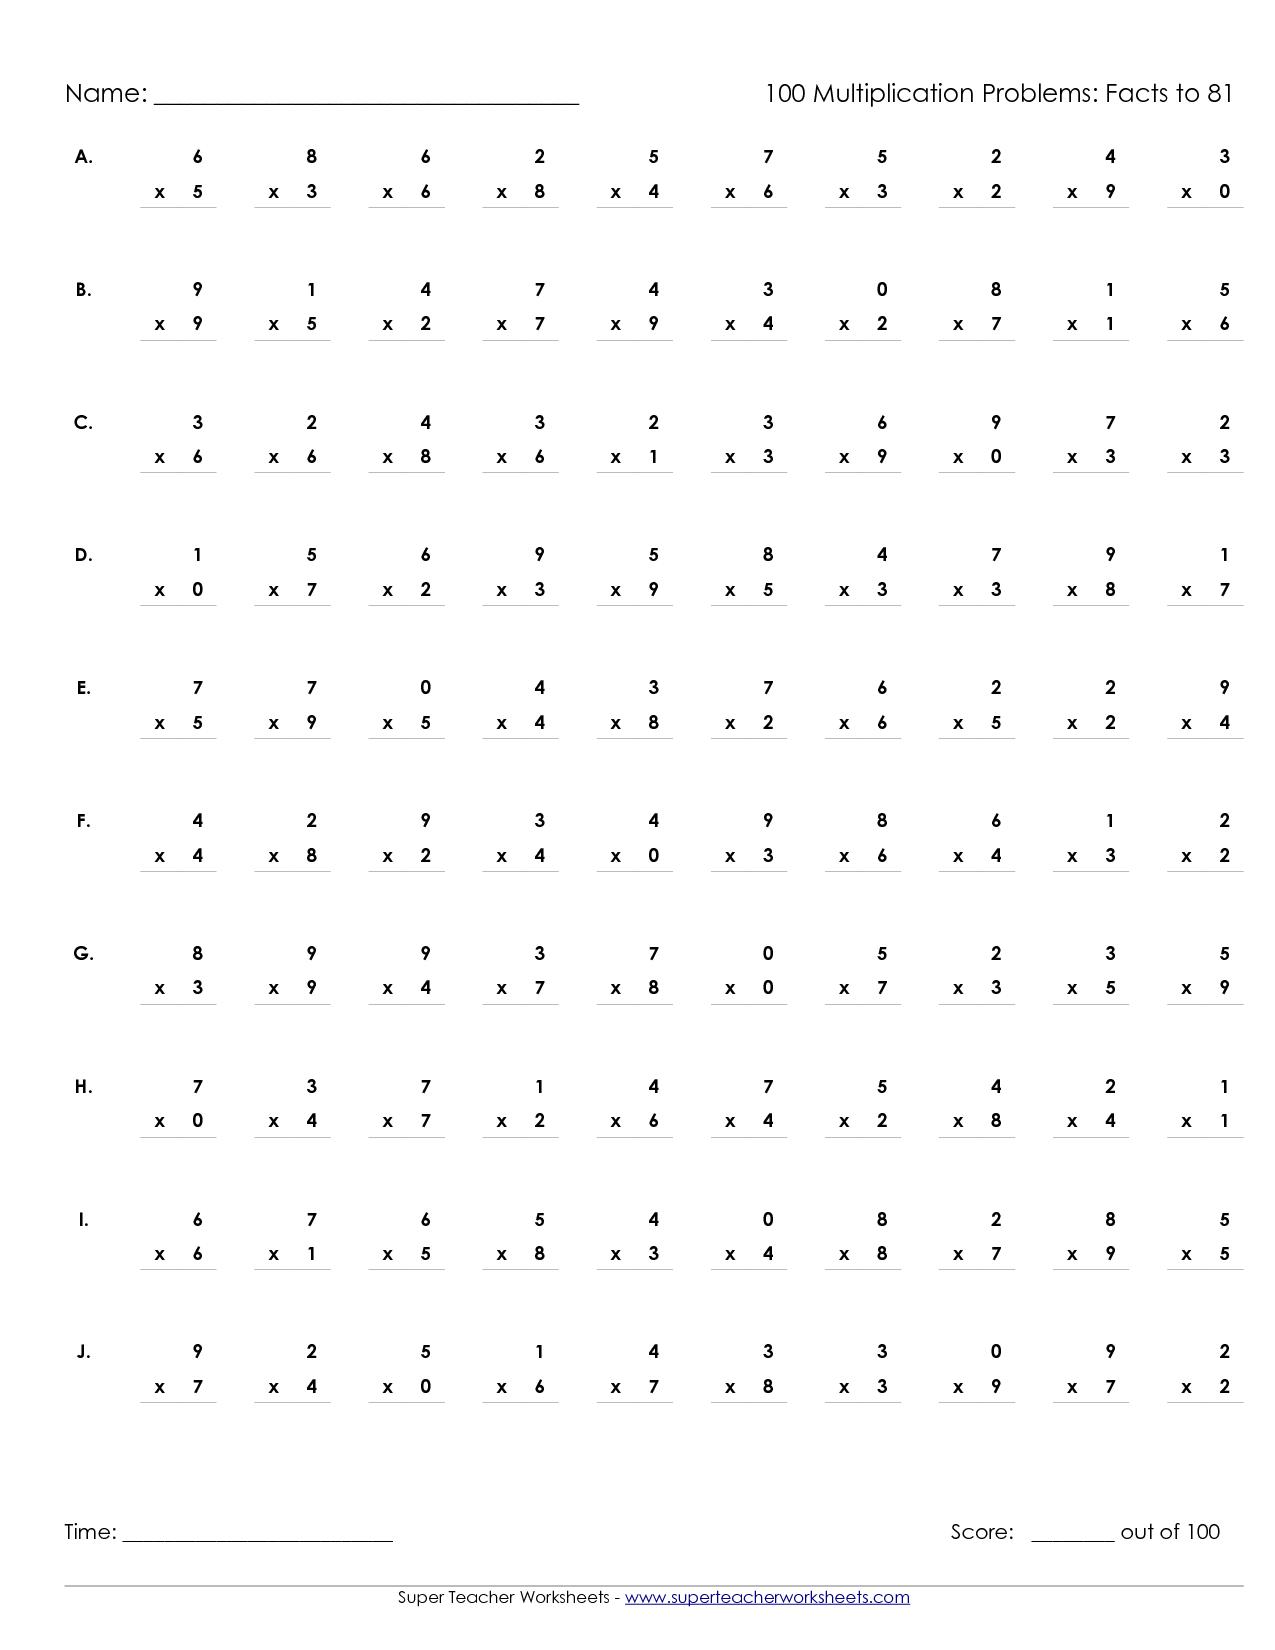 Printable Multiplication Worksheets 100 Problems   Multiplication worksheets [ 1650 x 1275 Pixel ]